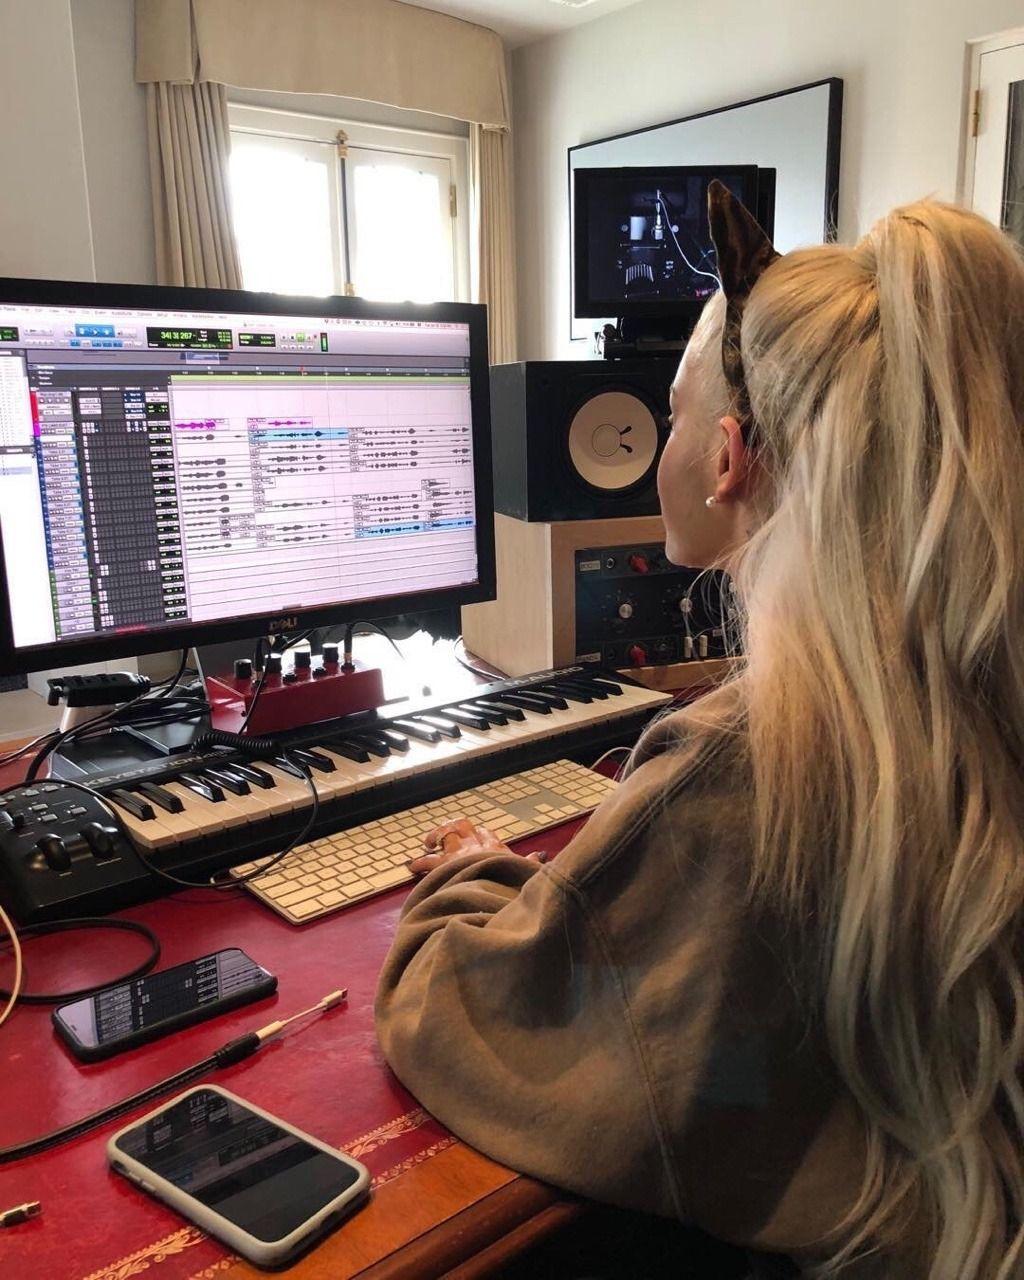 Ariana Grande News: Photo